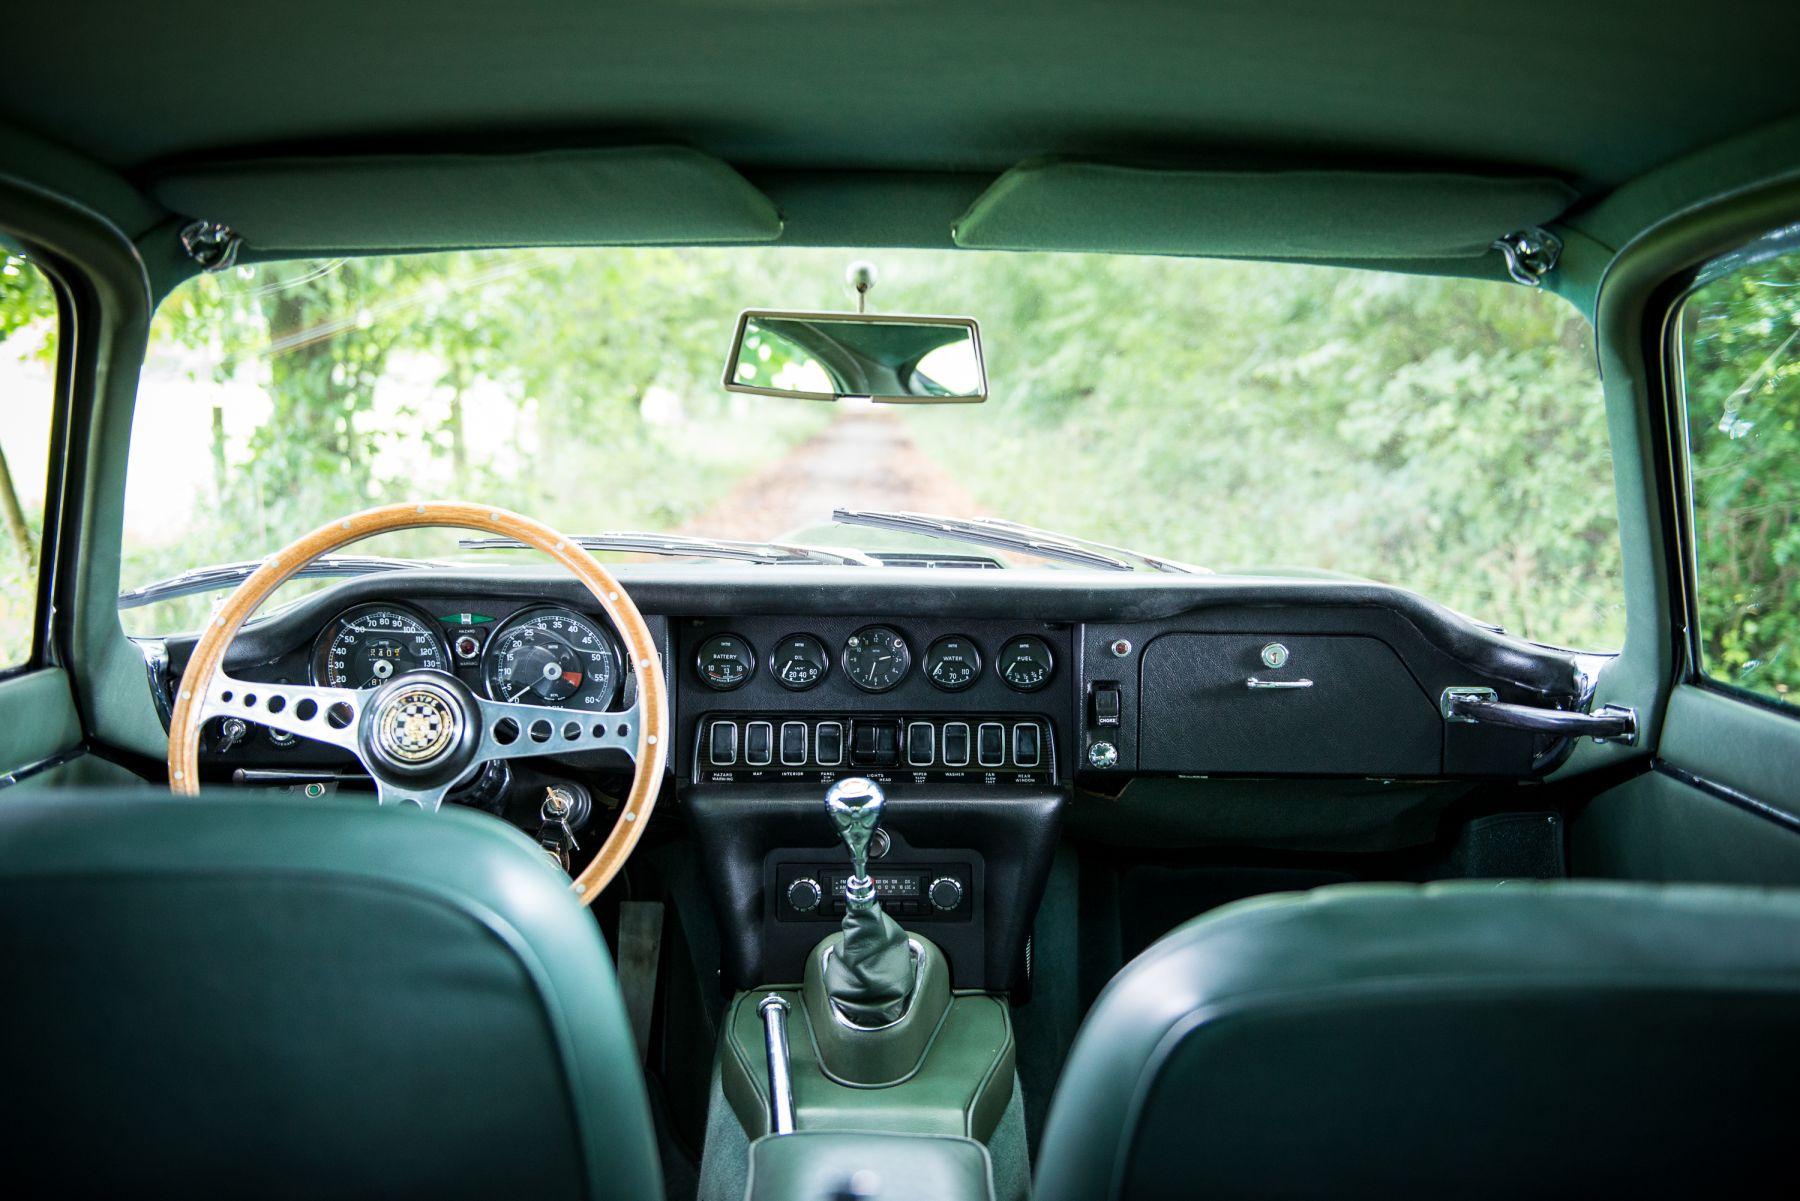 Jaguar E-type 4.2 Fixed Head Coupe 1967 interior